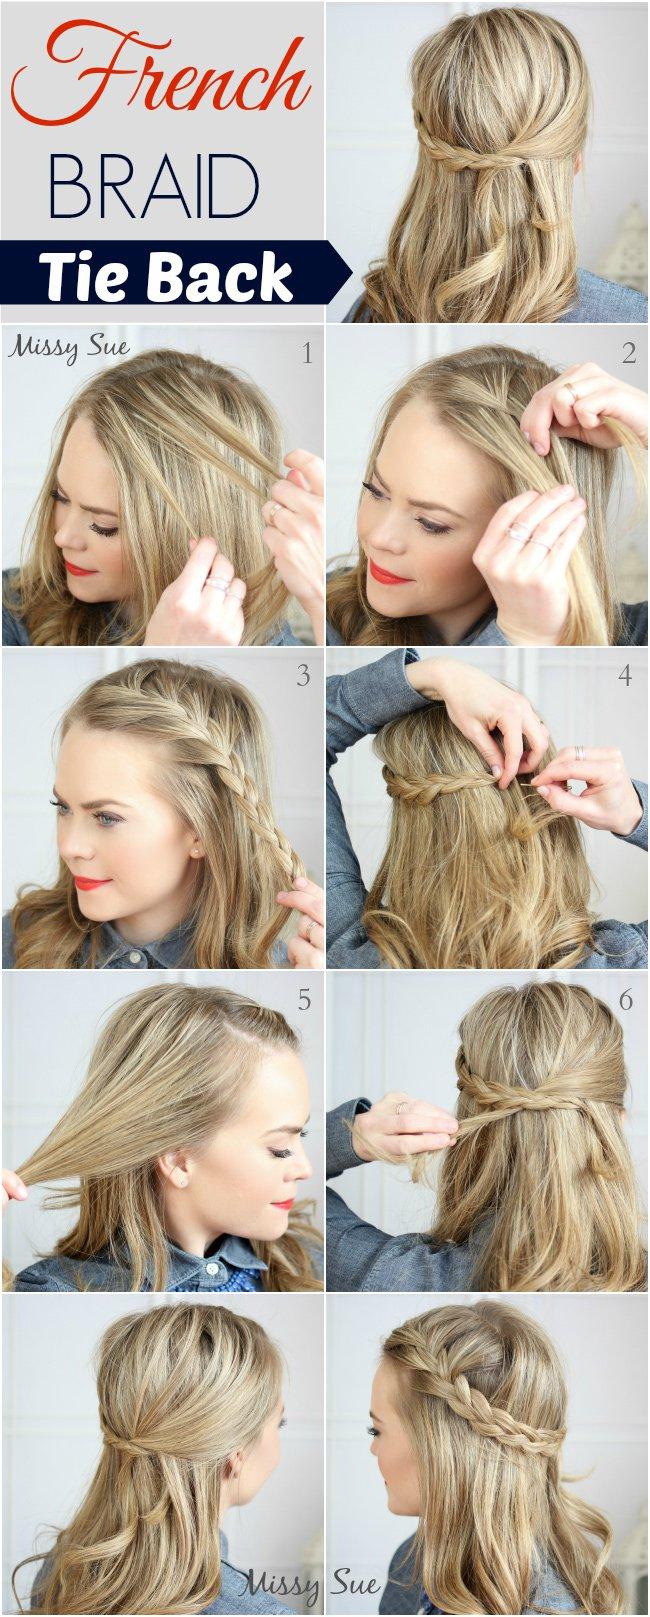 Braided Hairstyle Tutorials For Autumn Season 2016-17 4